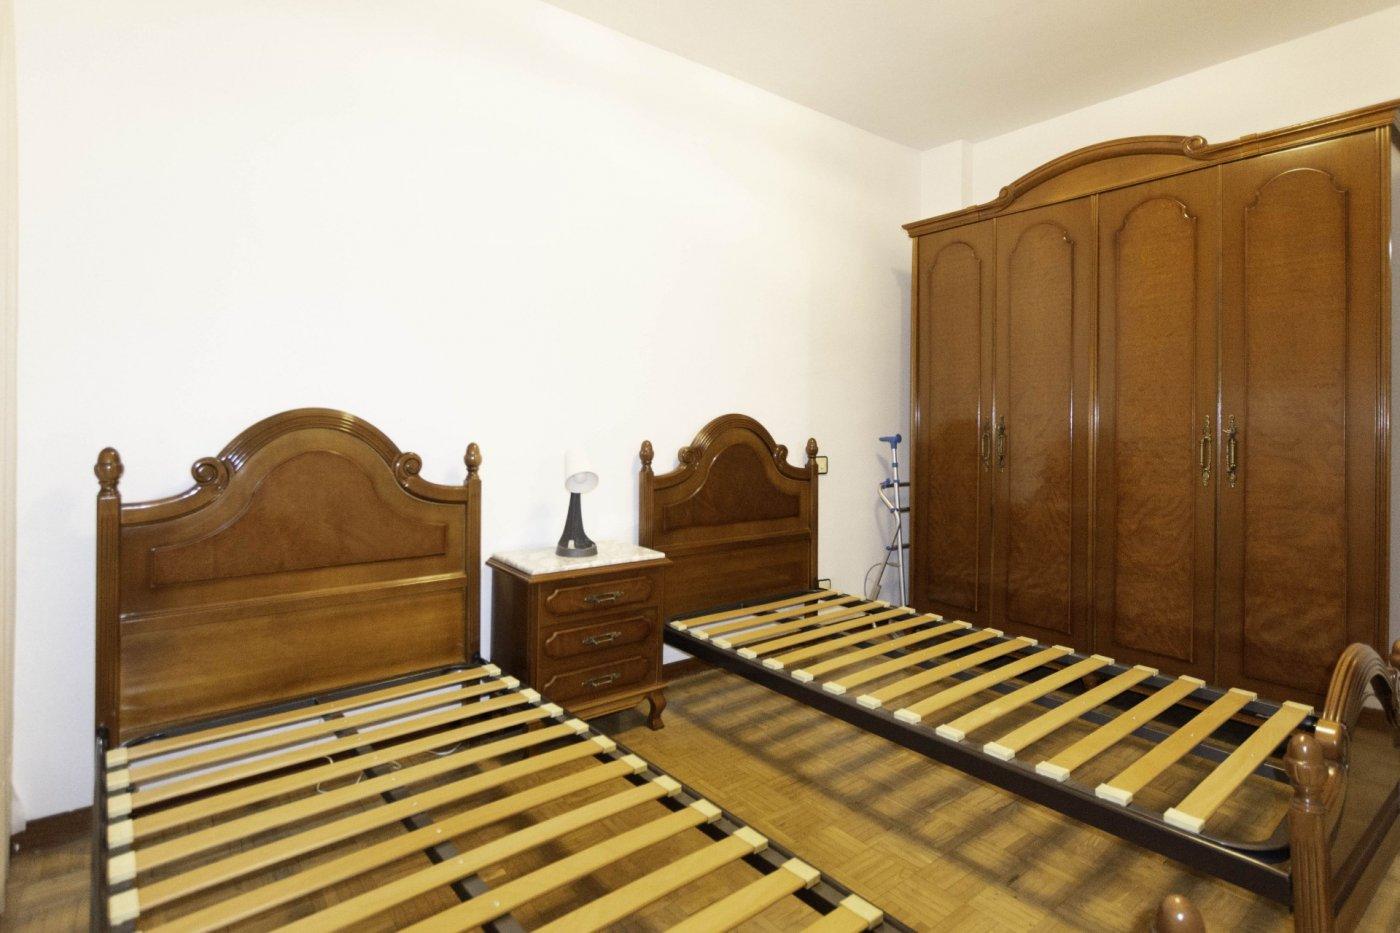 Apartamento en vallobin - imagenInmueble6